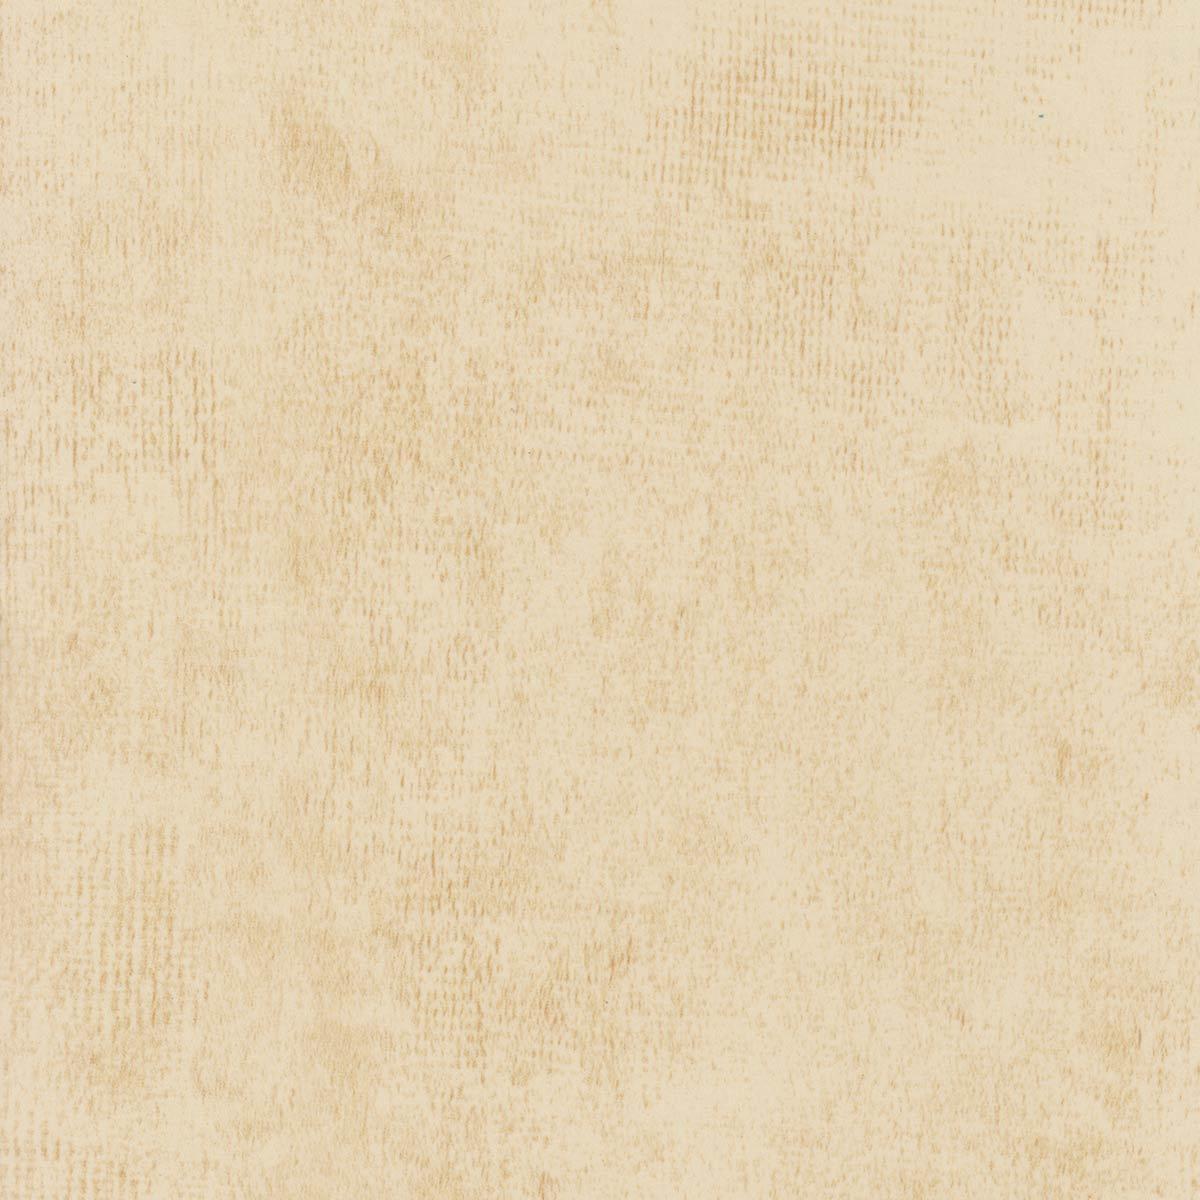 Coated panel PVC code PS-123255